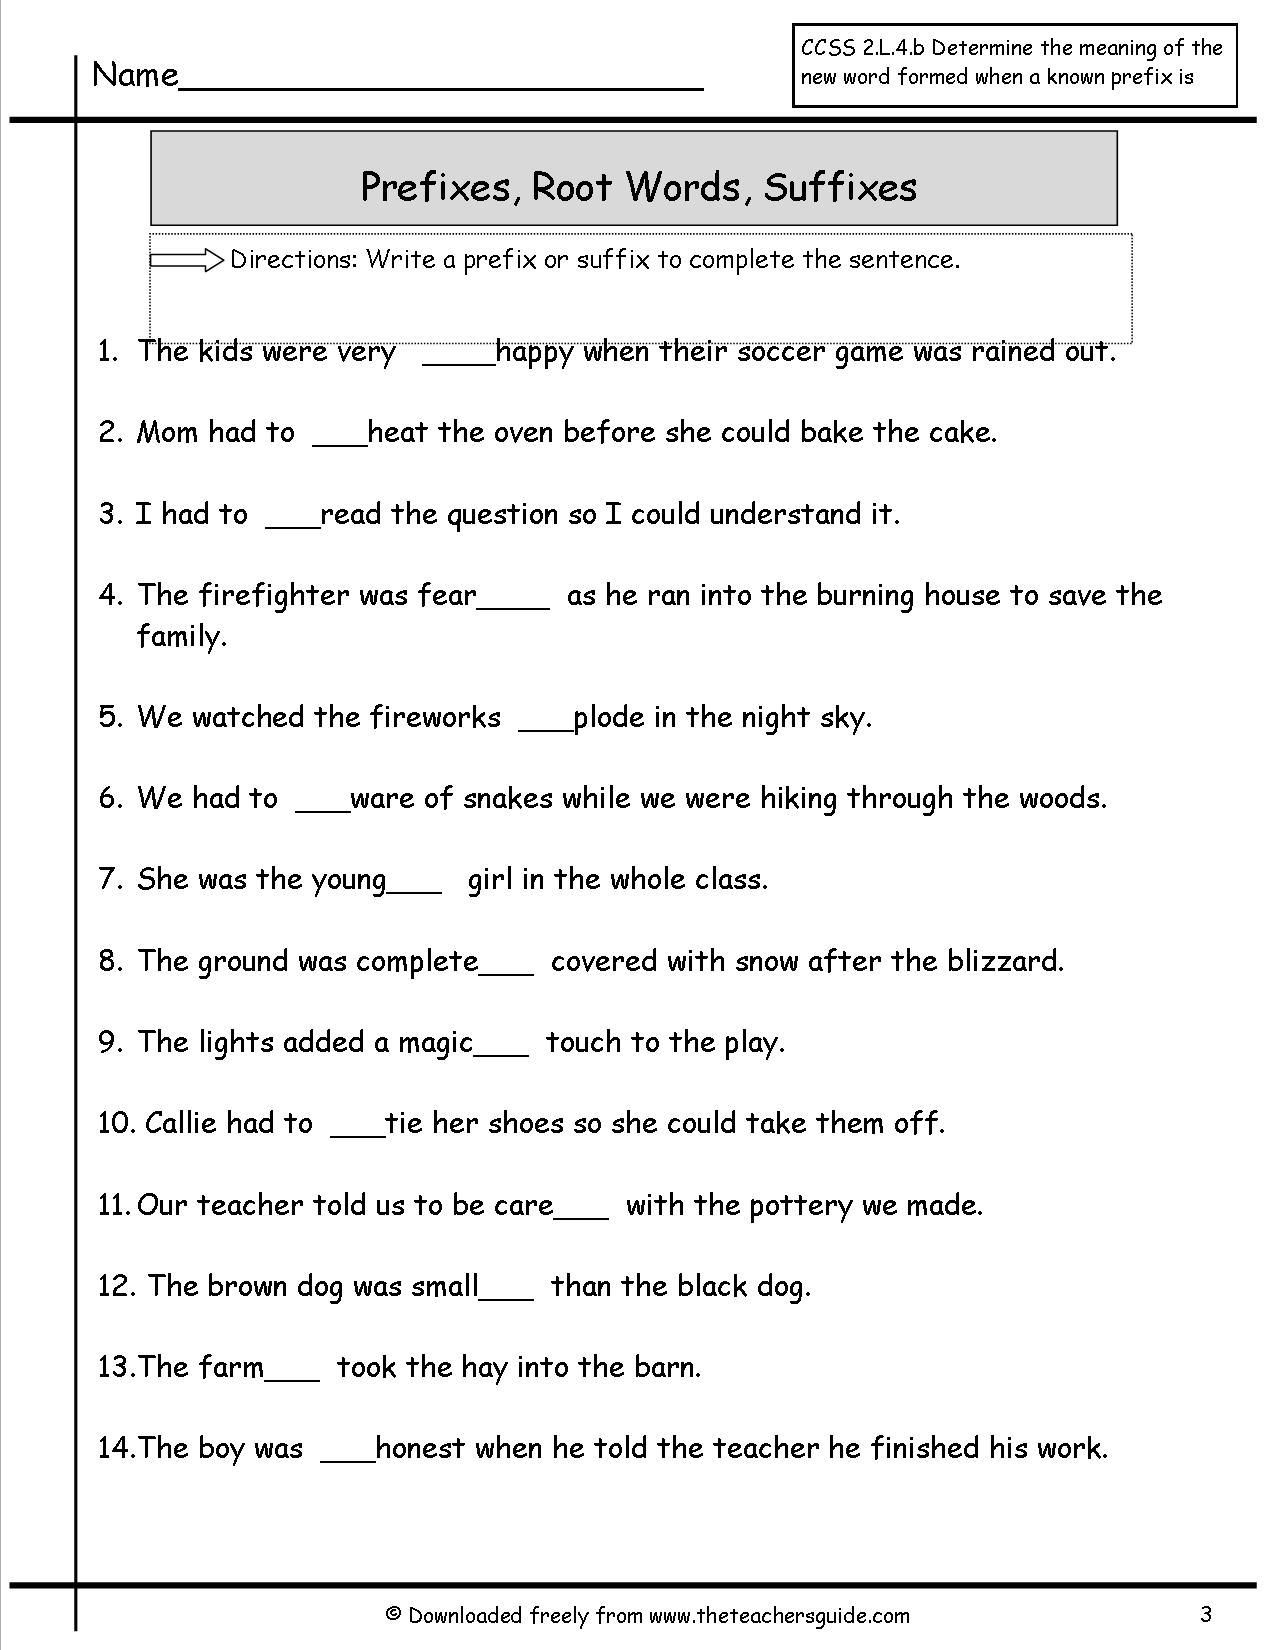 Prefixes Suffixes Worksheet